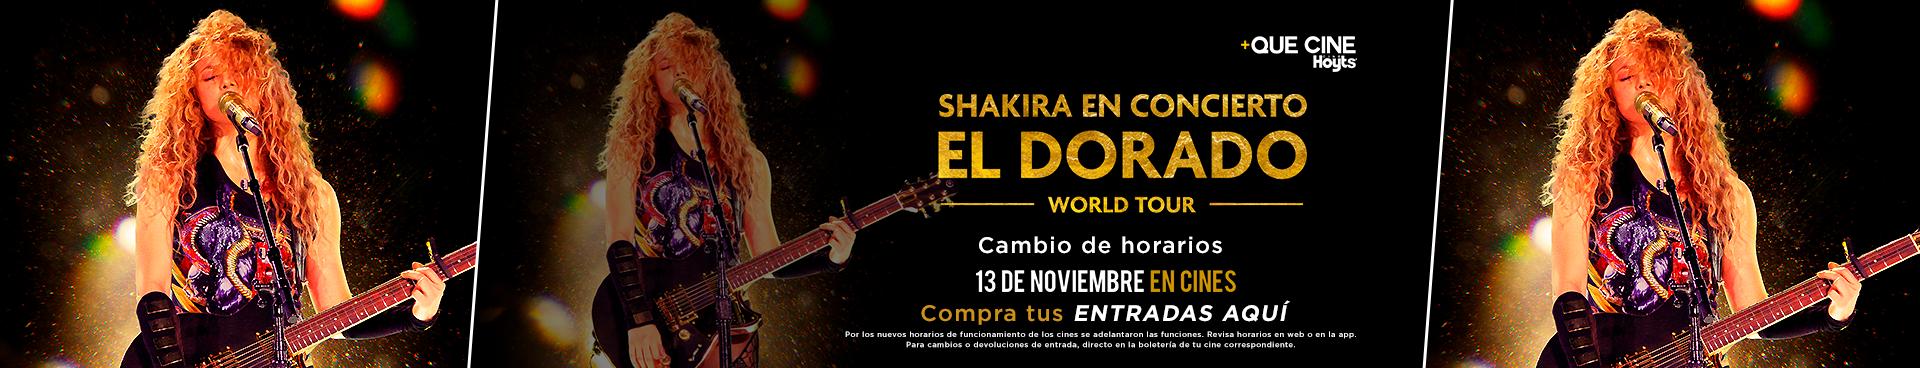 PREVENTAS +QUE CINE NOVIEMBRE:  SHAKIRA EN CONCIERTO: EL DORADO WORLD TOUR, 13 DE NOVIEMBRE + DEPECHE MODE: SPIRITS IN THE FOREST, 21 DE NOVIEMBRE COMPRA AQUÍ TU ENTRADA